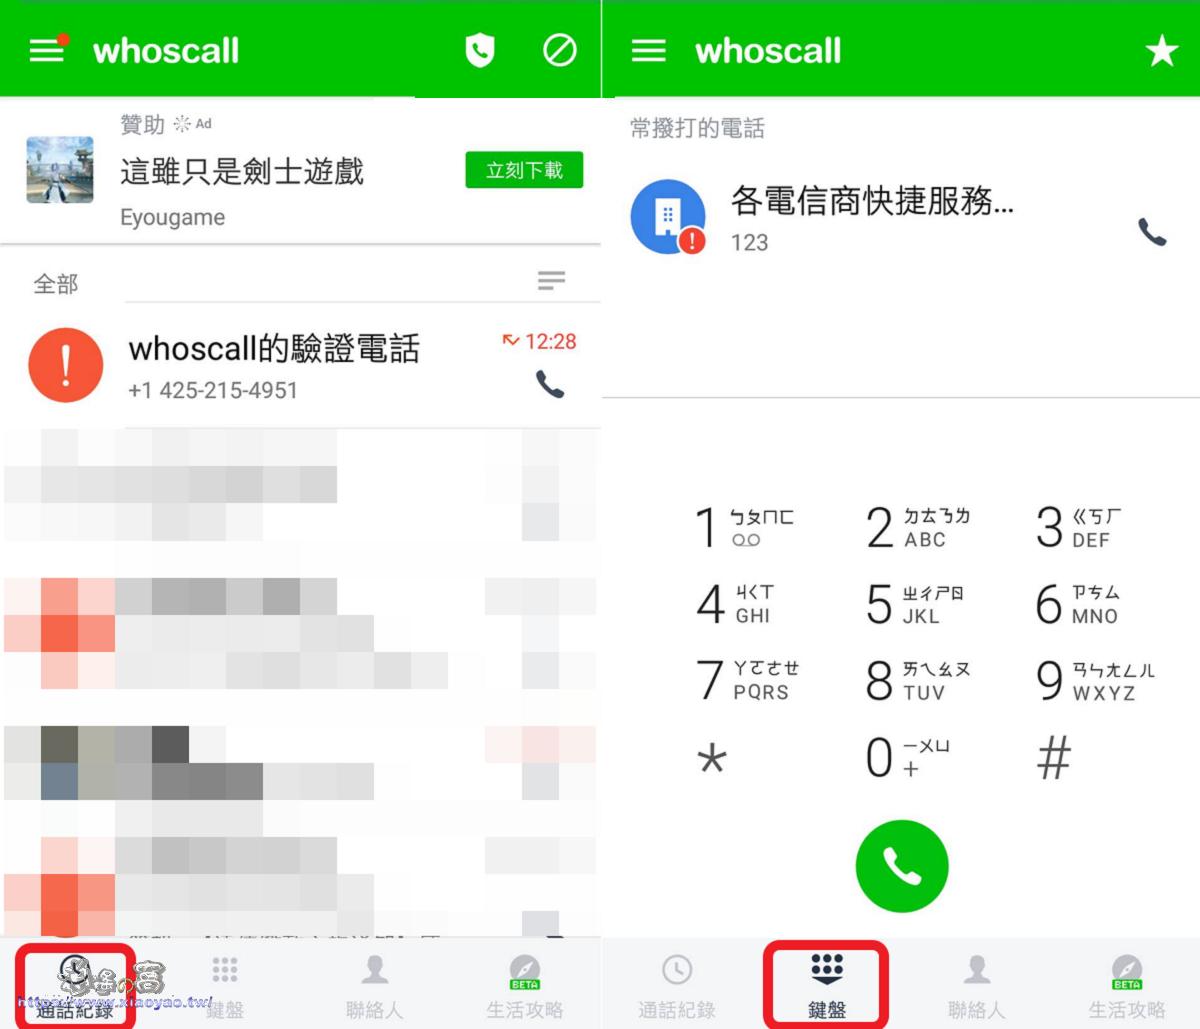 Whoscall 幫你擋掉詐騙、騷擾電話